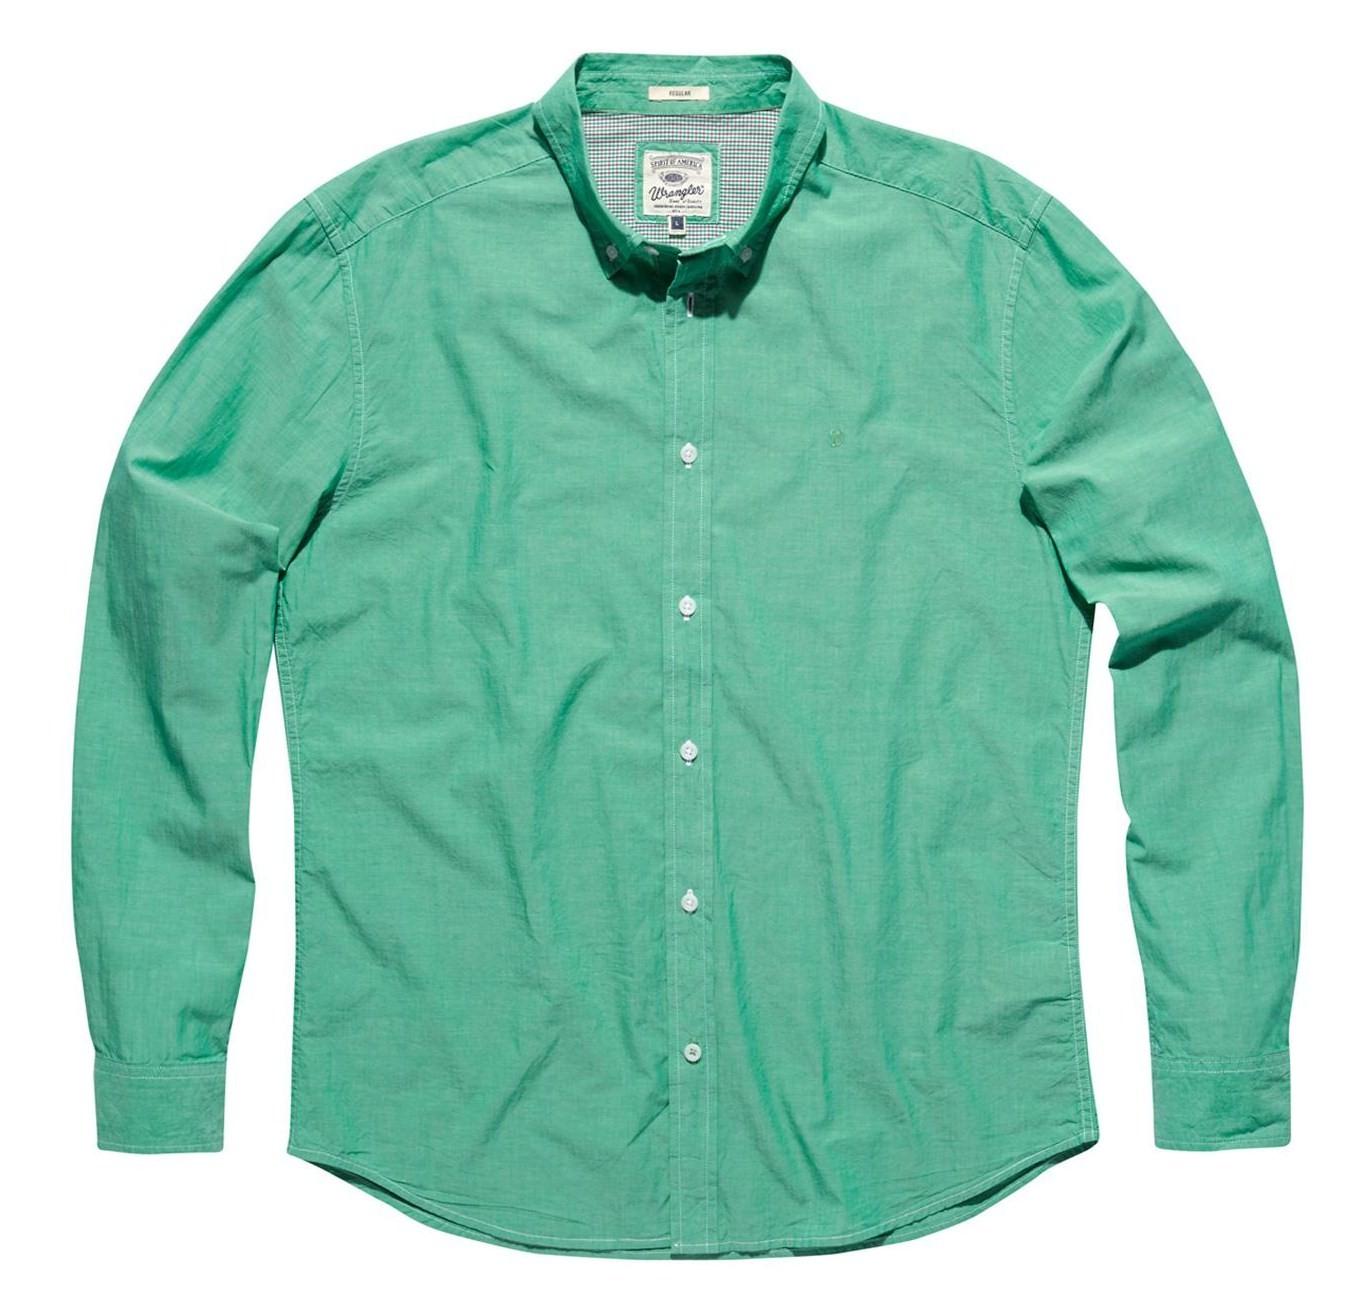 Pánská košile WRANGLER W57651N79 REGULAR FIT COOL COMFORT Jelly Bean Velikost: XXL